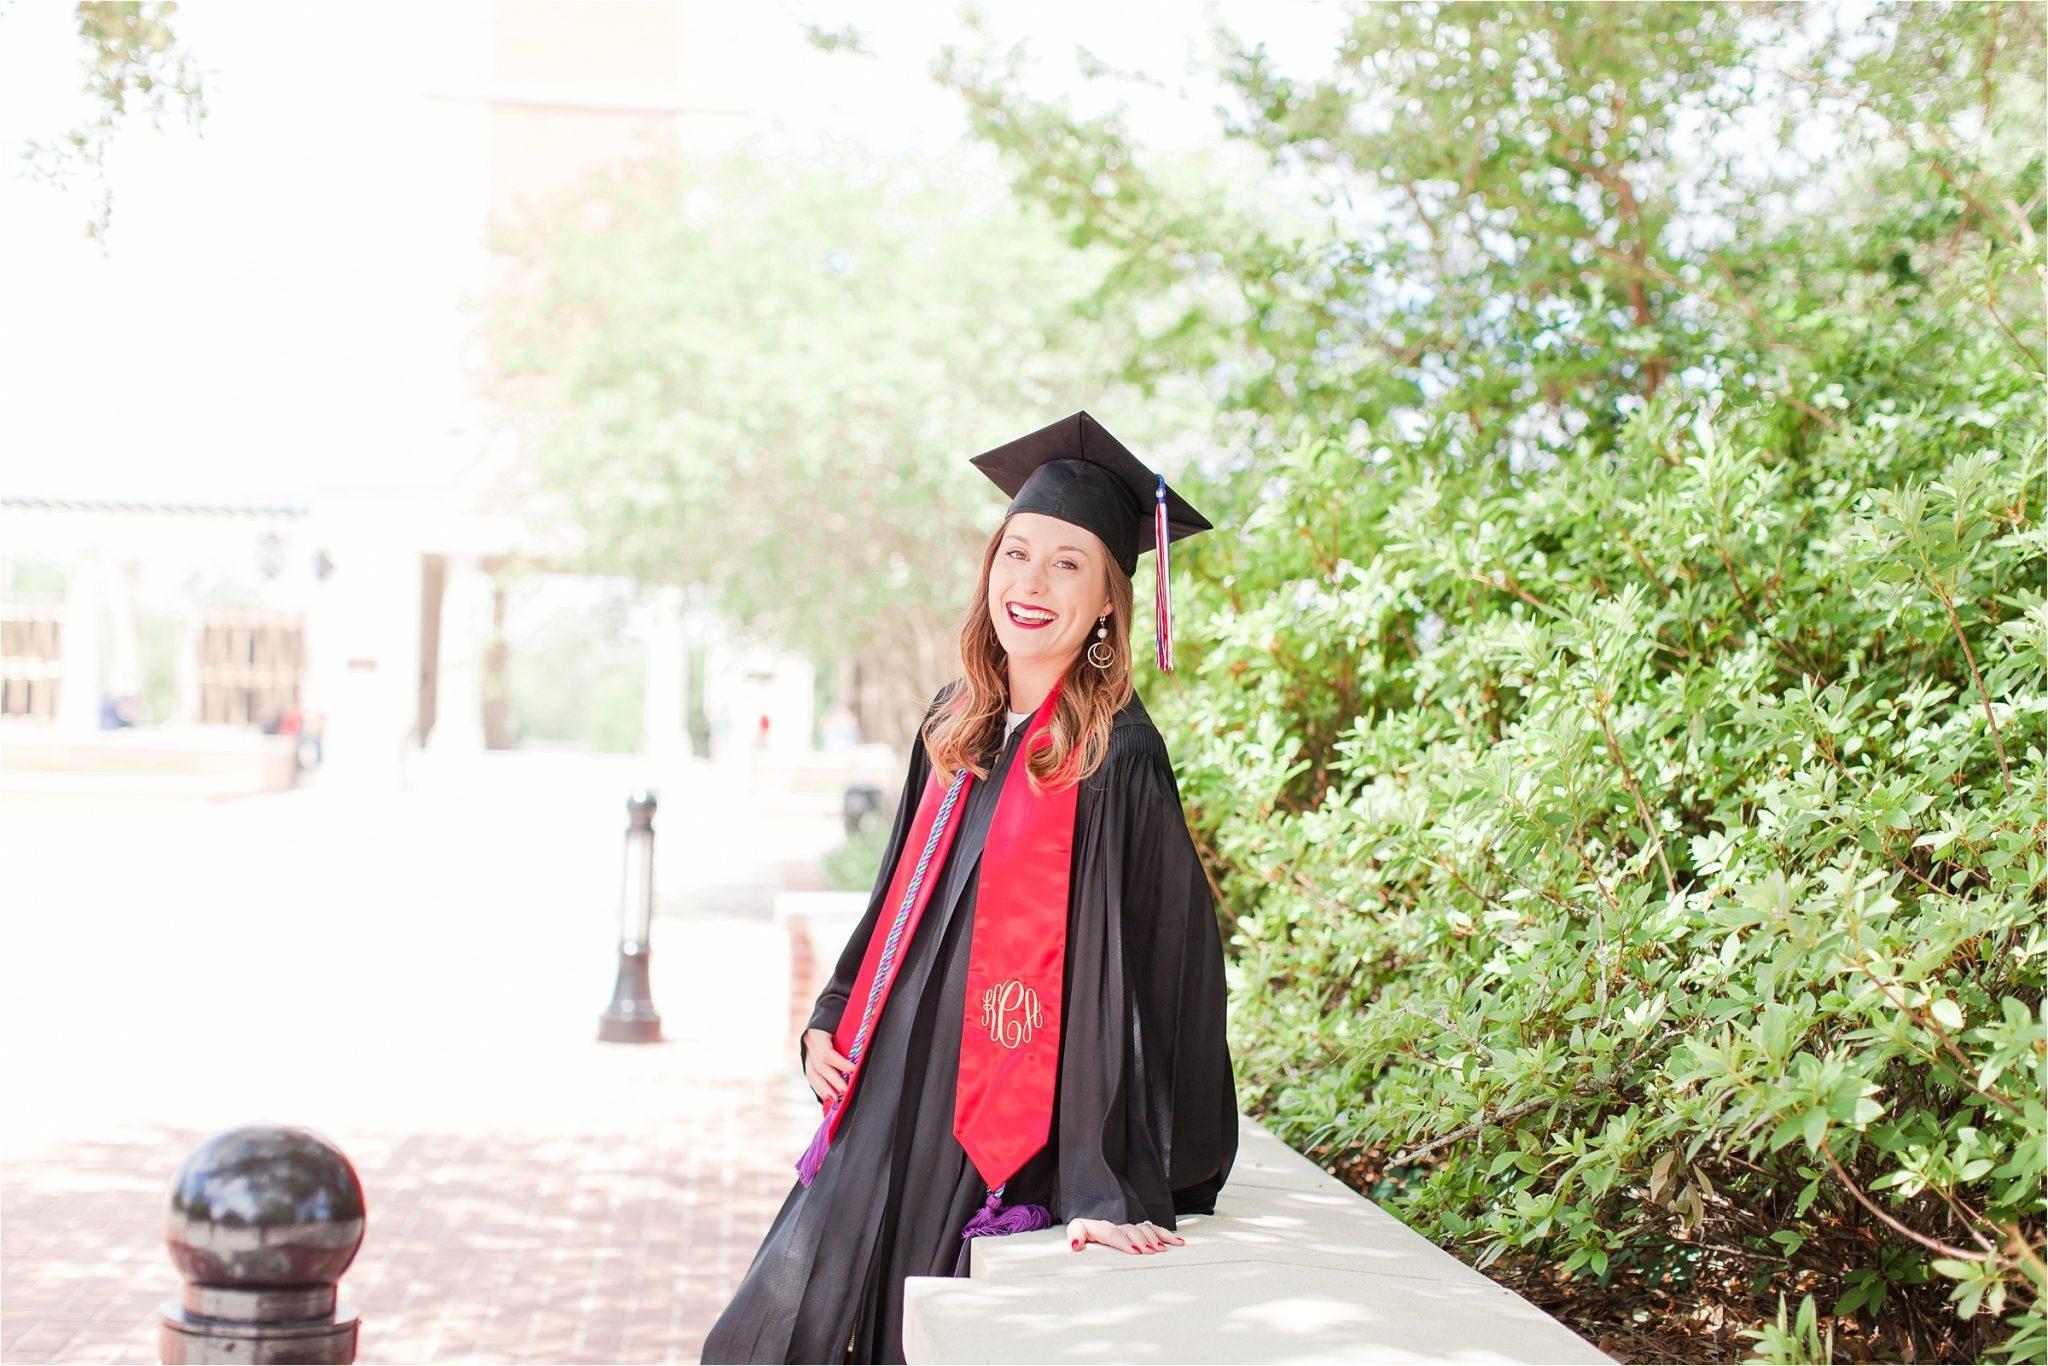 Graduating The University of South Alabama